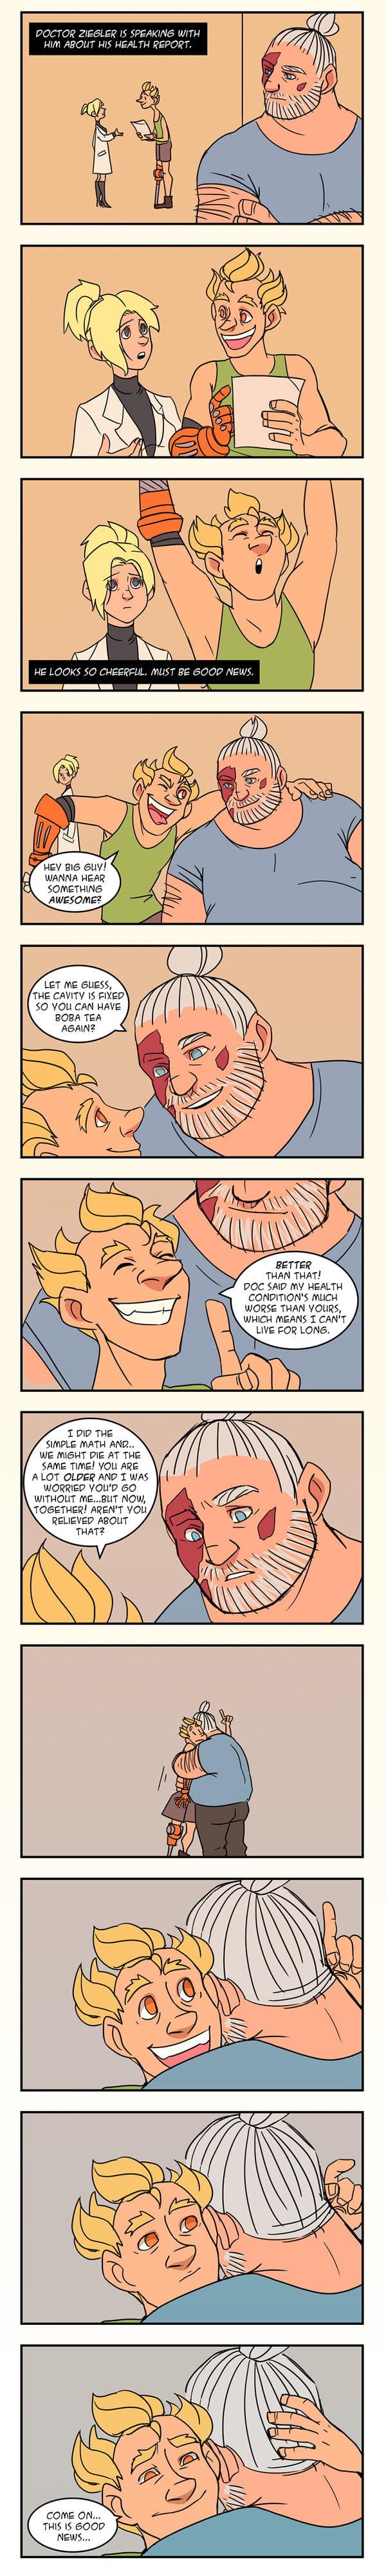 Damn Genji with Onions